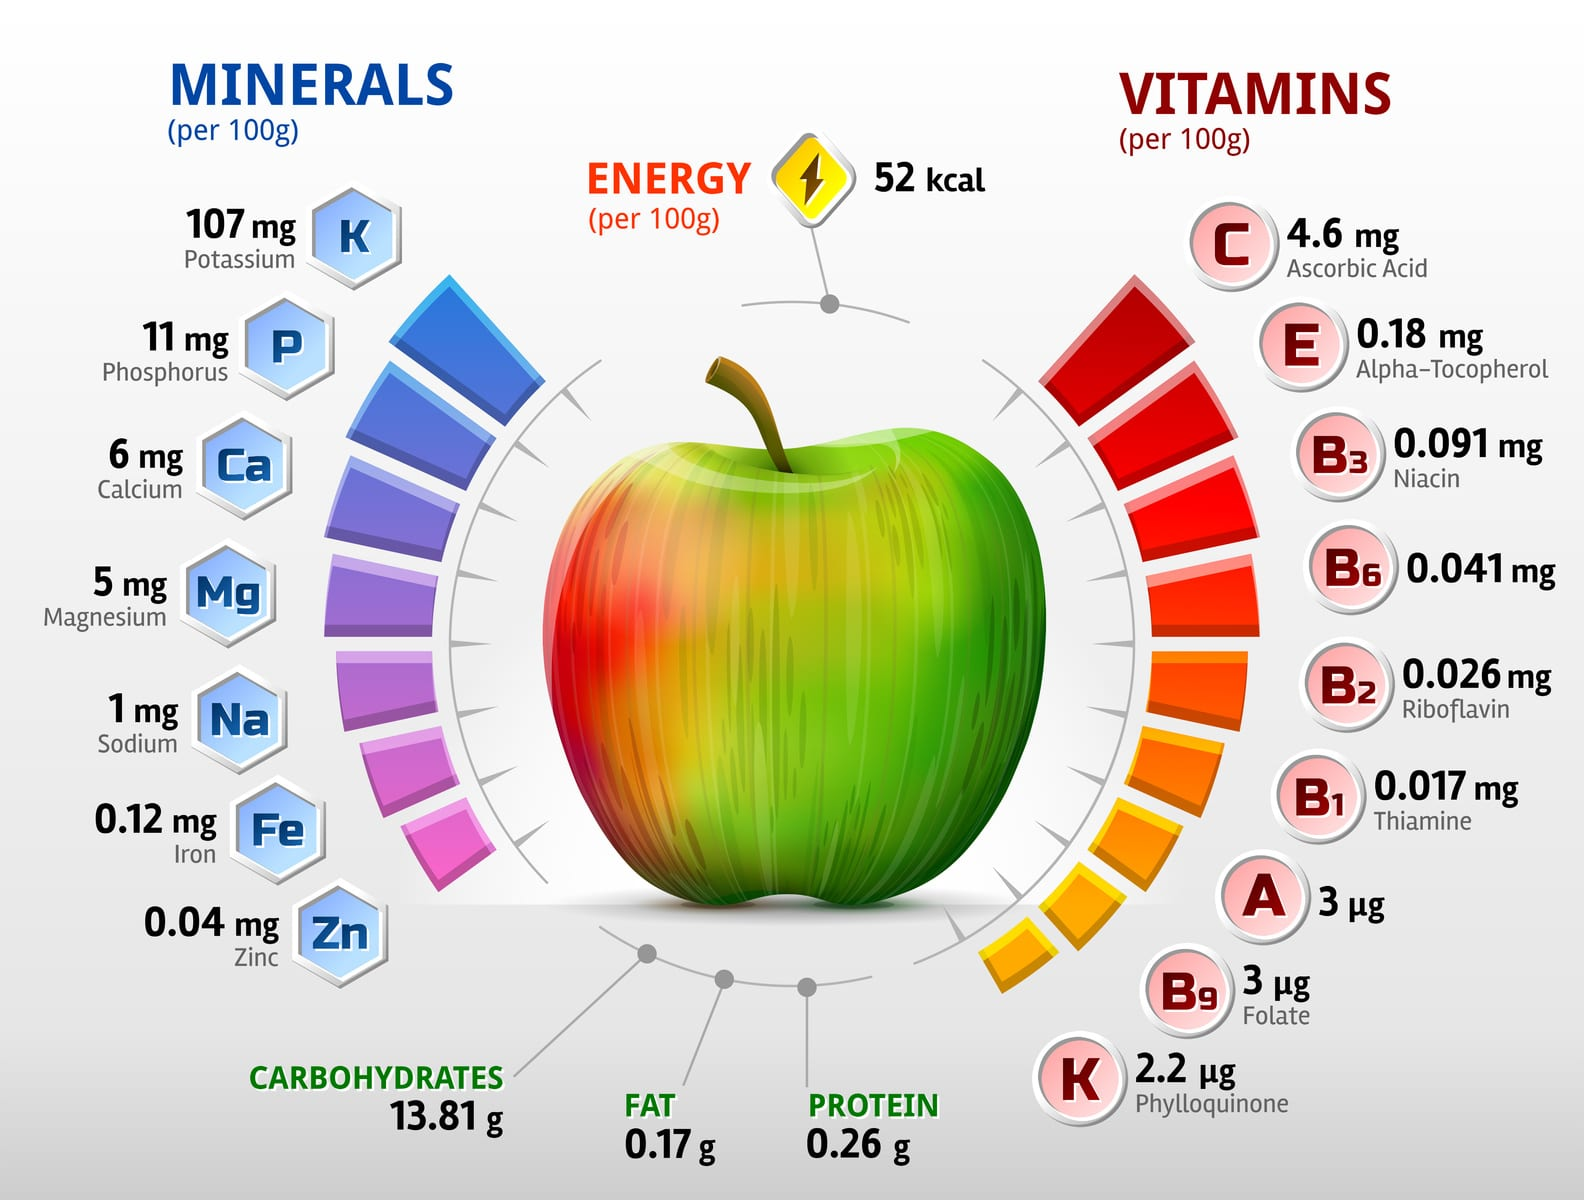 Studies Show That Supplemented Vitamins Do Not Always Decrease Incidence Of  Disease